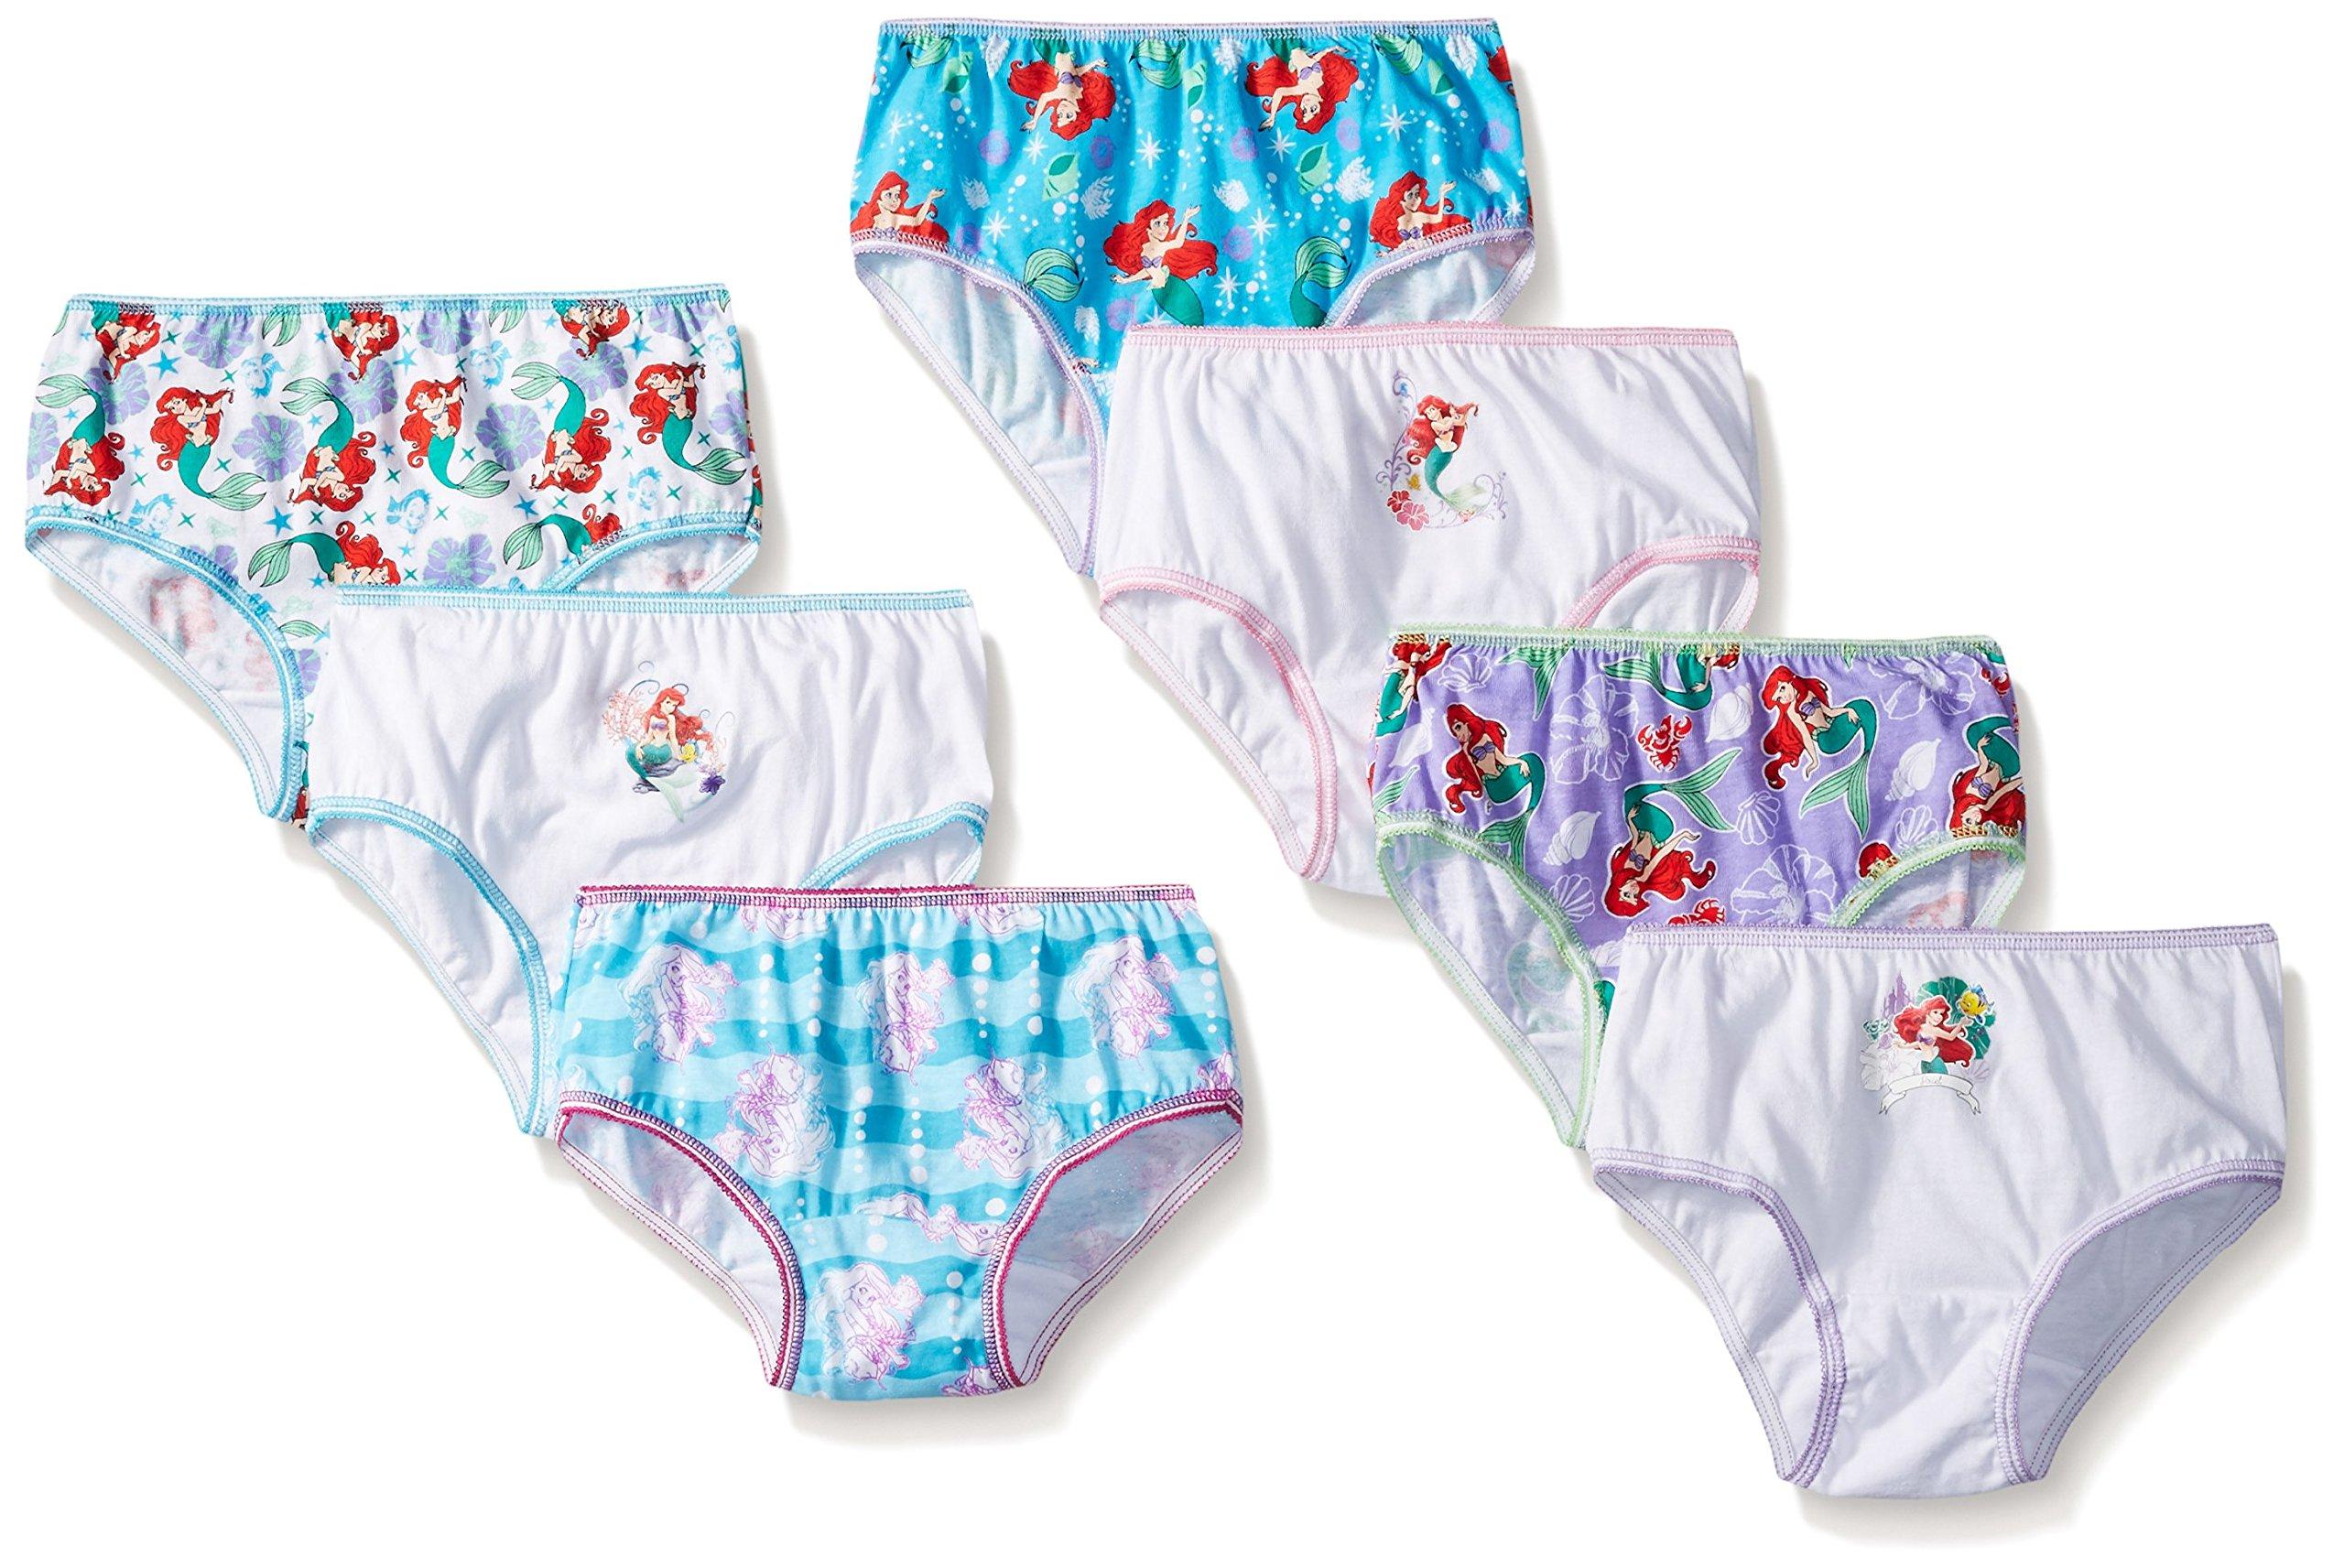 Disney Big Girls Ariel 7 Piece Pack Panty, Assorted, 6